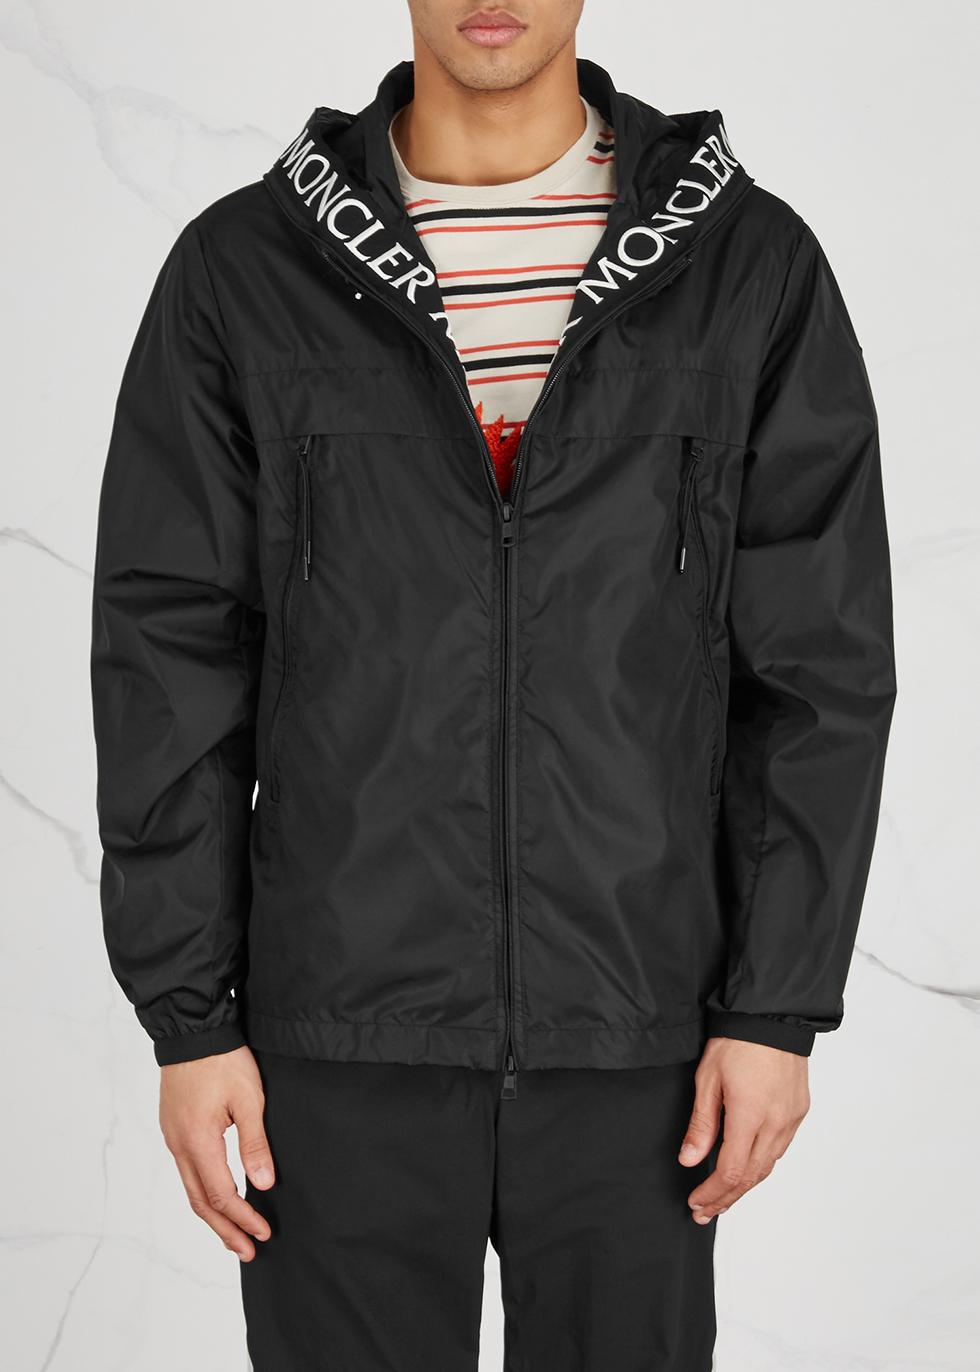 Massereau black hooded shell jacket - Moncler